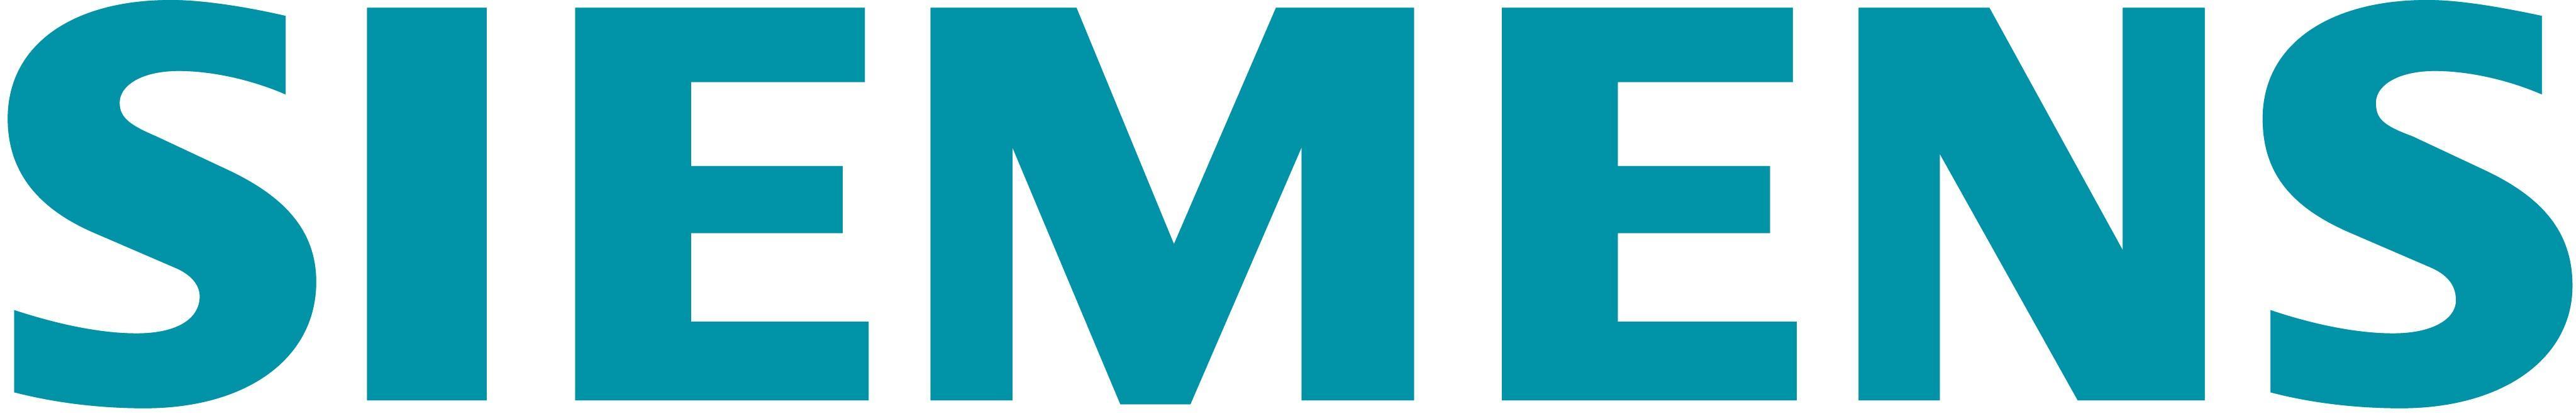 Siemens_logo-7